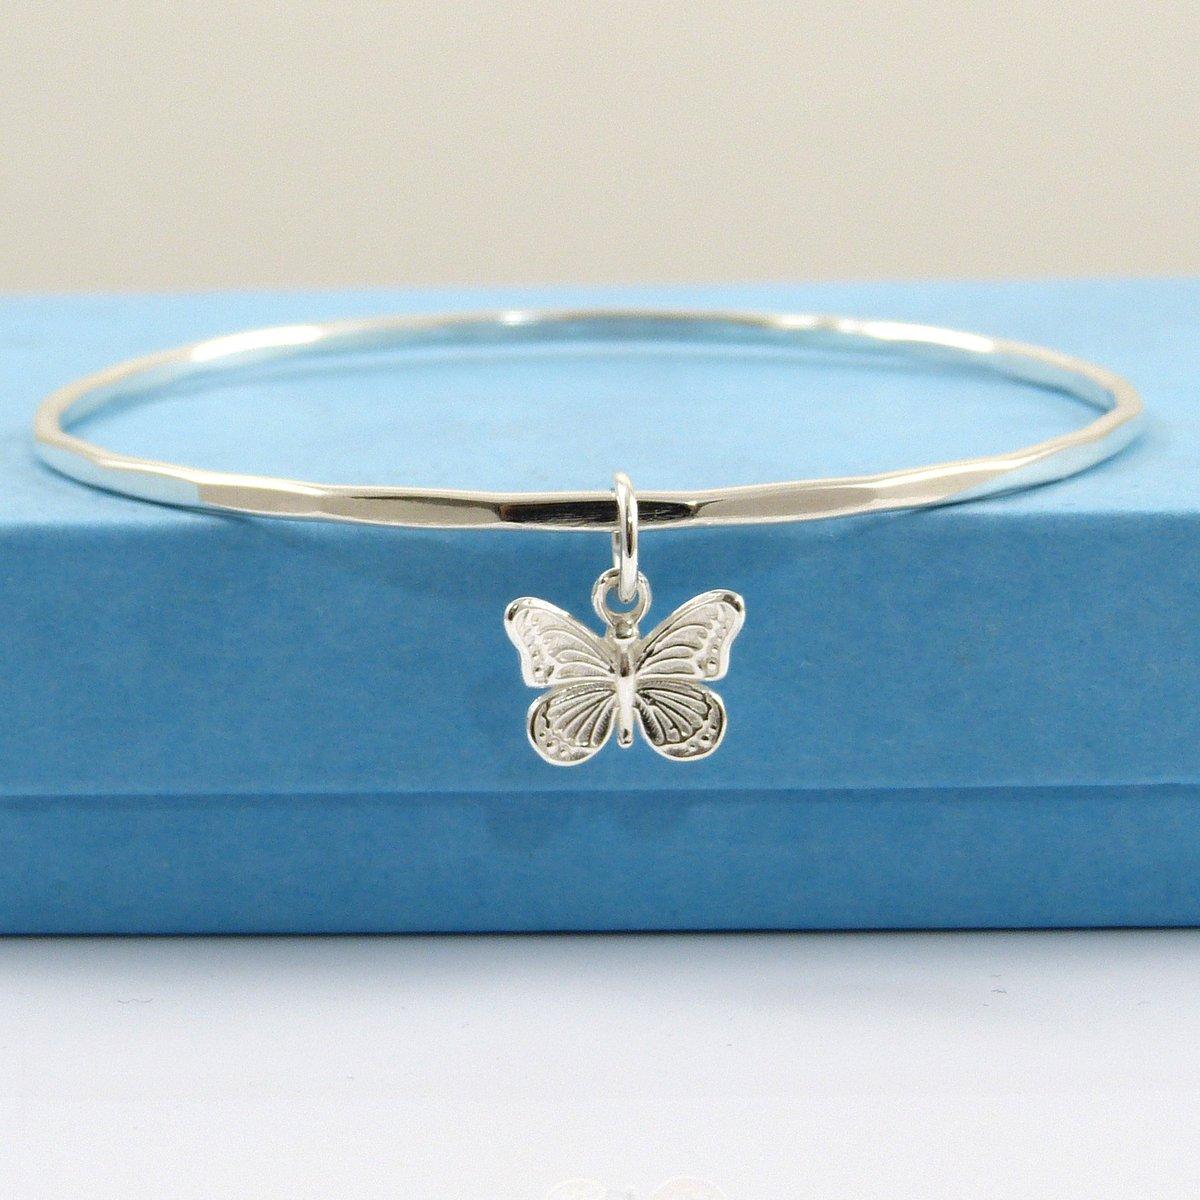 Sterling Silver Butterfly Bangle, Bangle Bracelet, SS Bangle, Sterling Silver Bangle,  Hammered Bangle, Butterflye Bangle  #handmade #seaglassjewelry #thestrandline #etsyshopowner #etsymade #etsysellers #NauticalJewellery